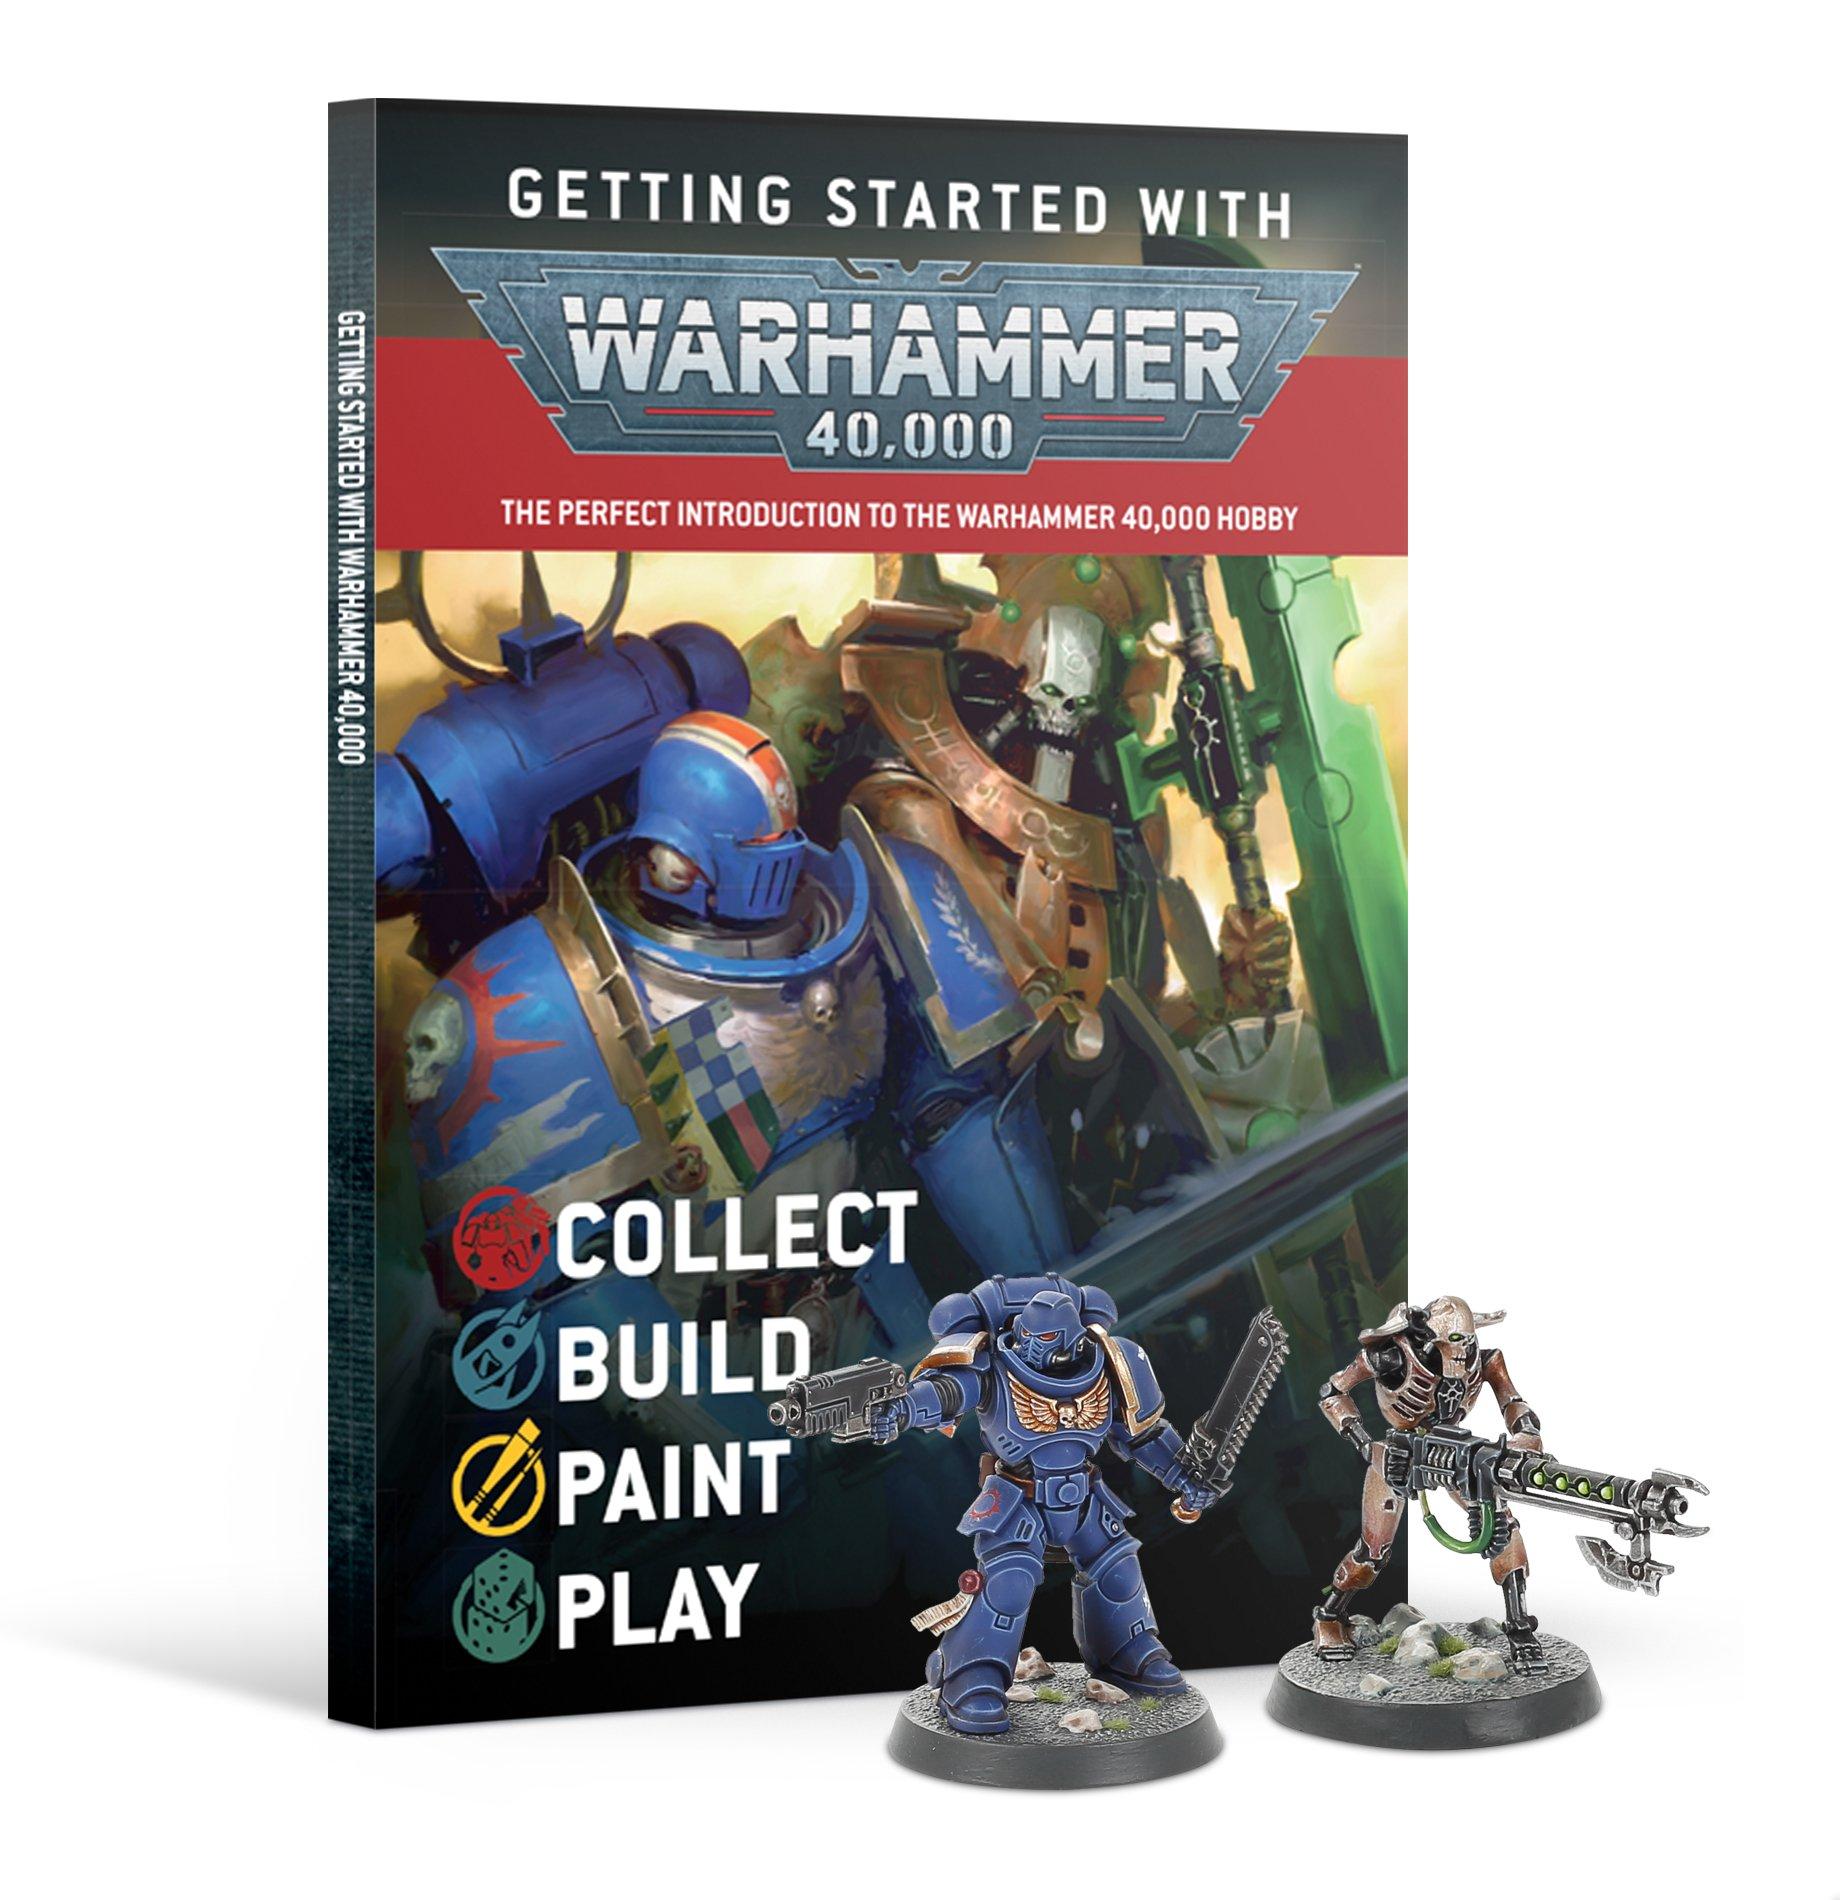 https___trade.games-workshop.com_assets_2020_10_BS-F-40-06-60040199131-GettingStarted with Warhammer 40000